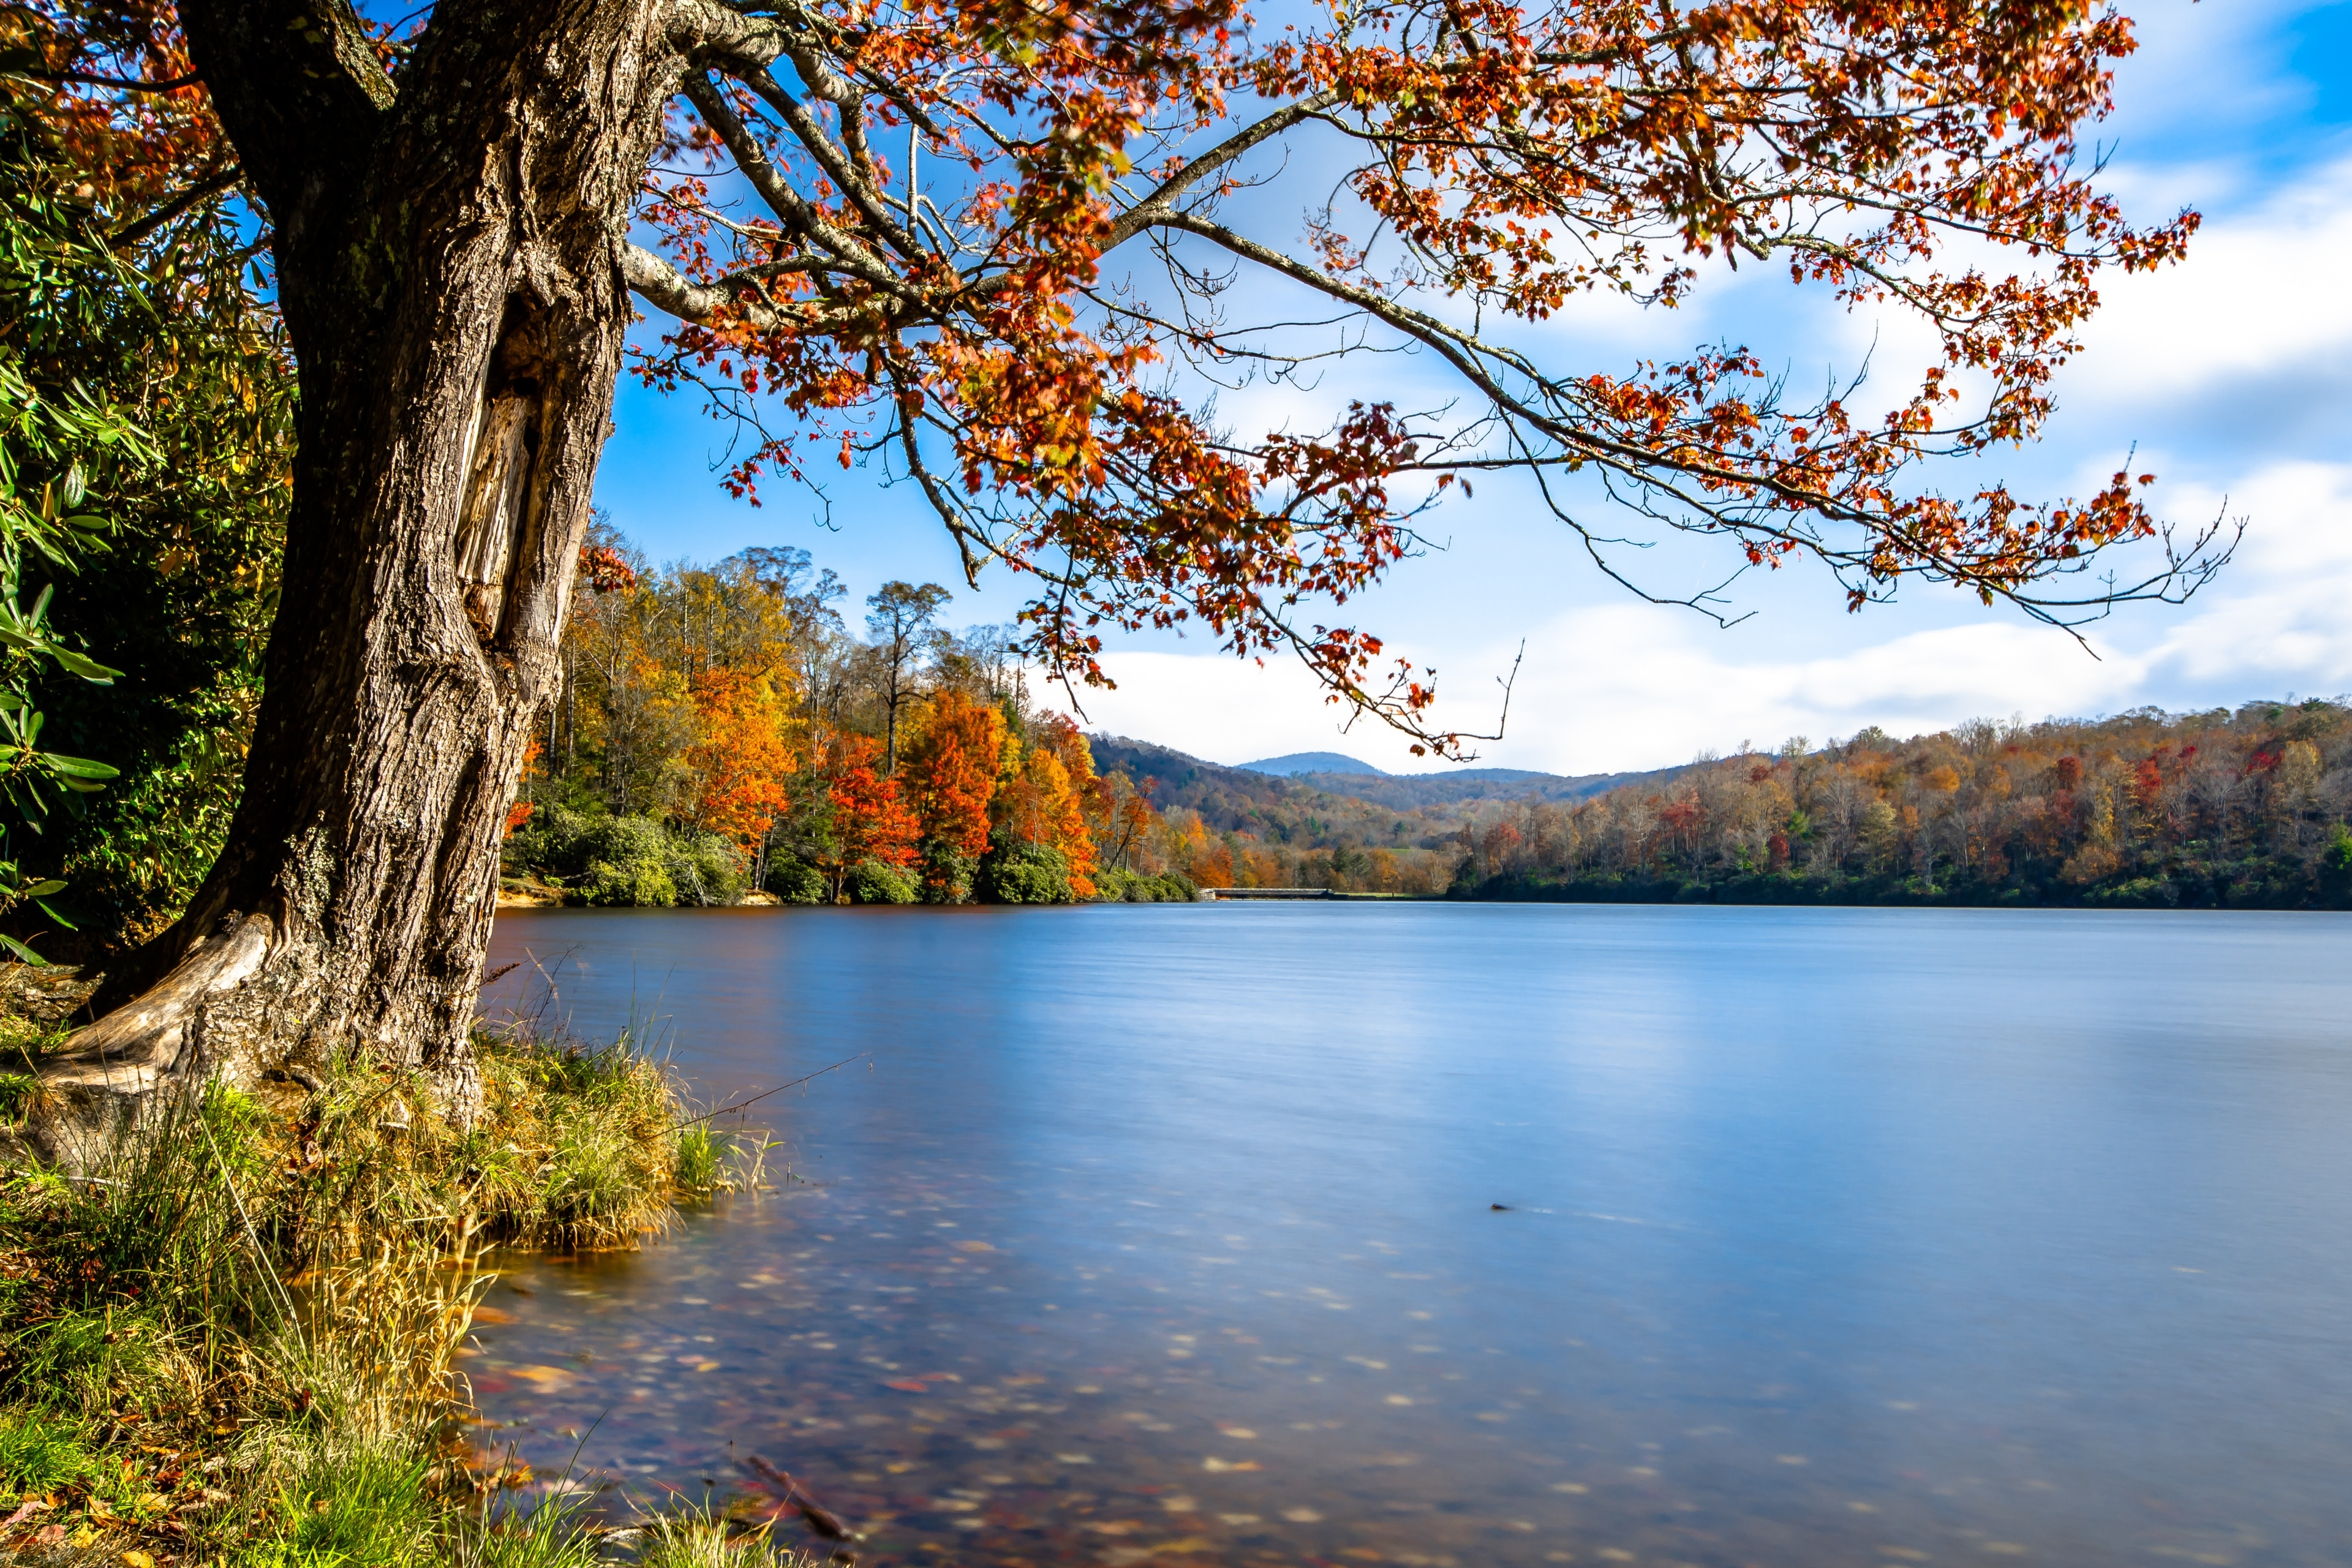 Watauga County, North Carolina, United States of America